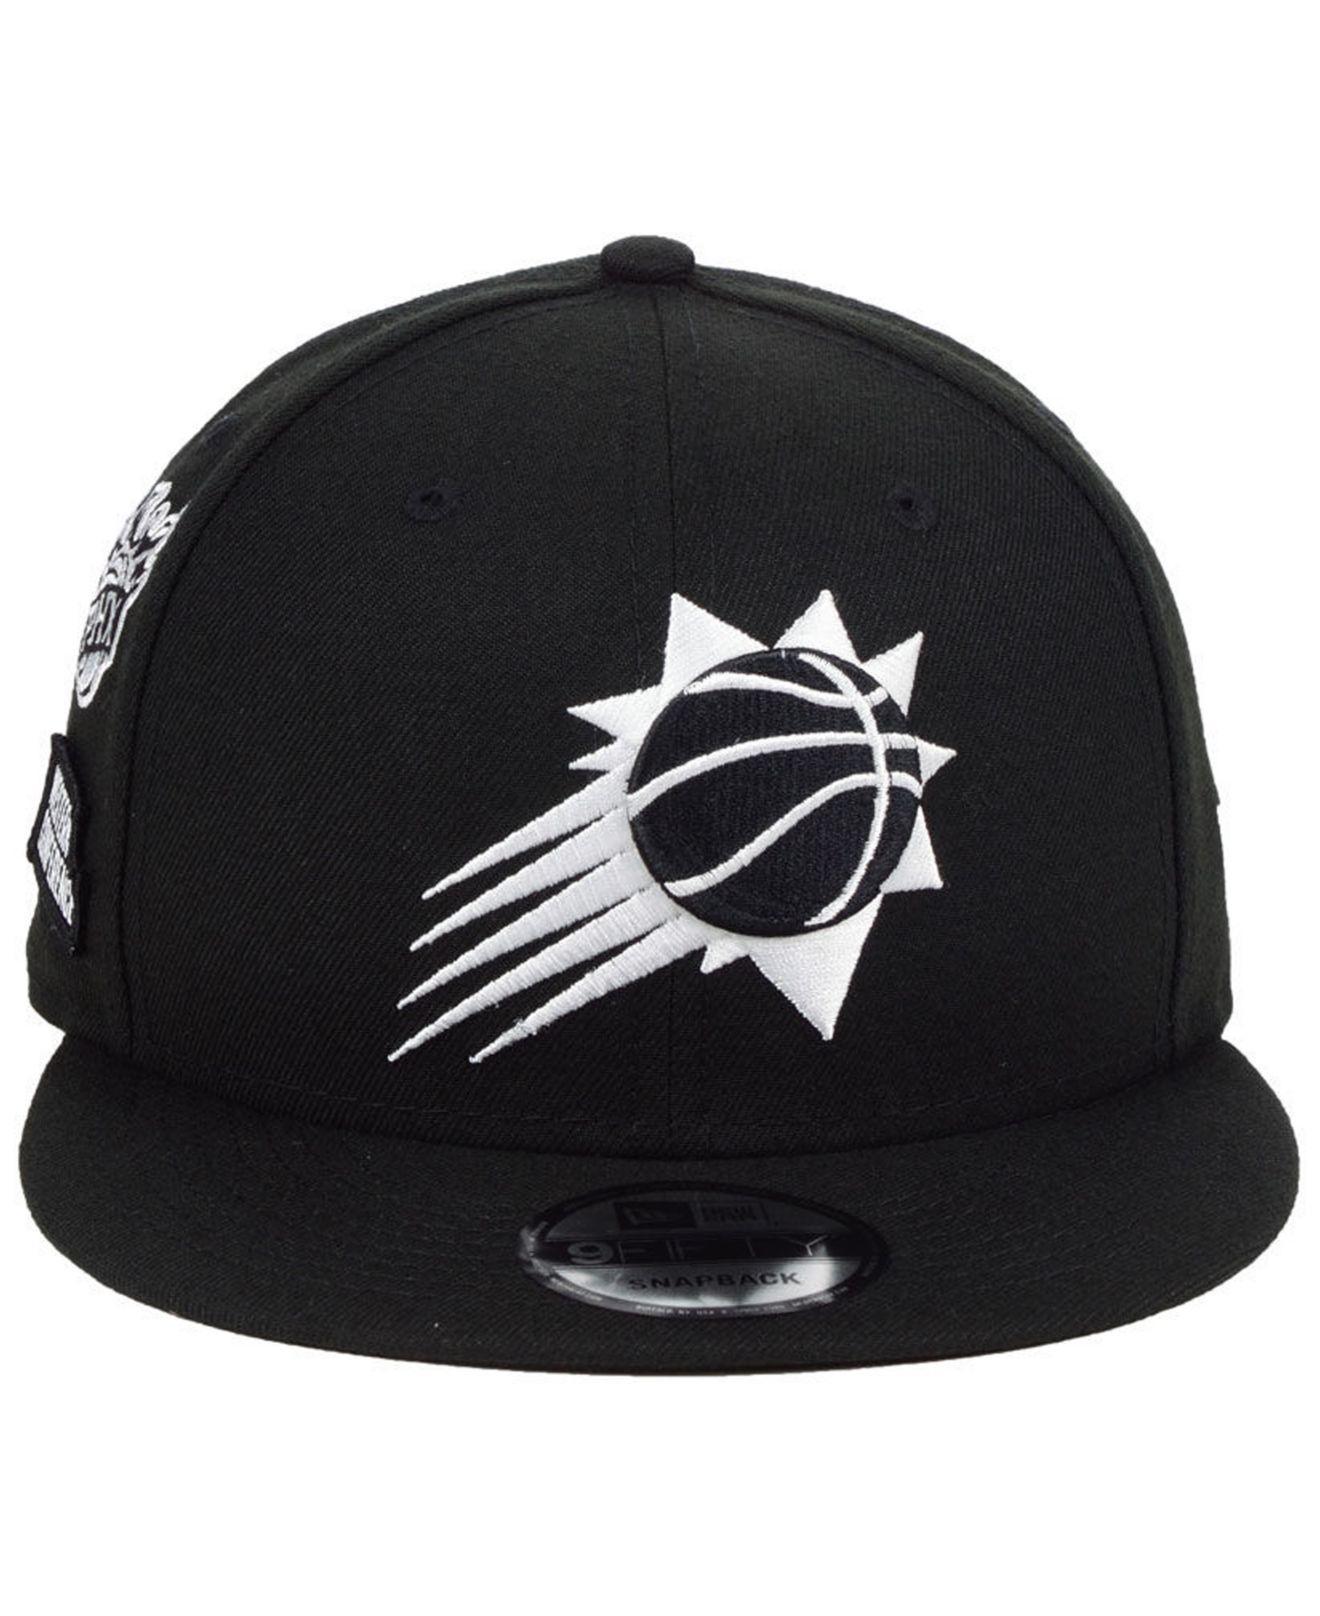 huge discount 793ef 5a443 Lyst - KTZ Phoenix Suns Night Sky 9fifty Snapback Cap in Black for Men